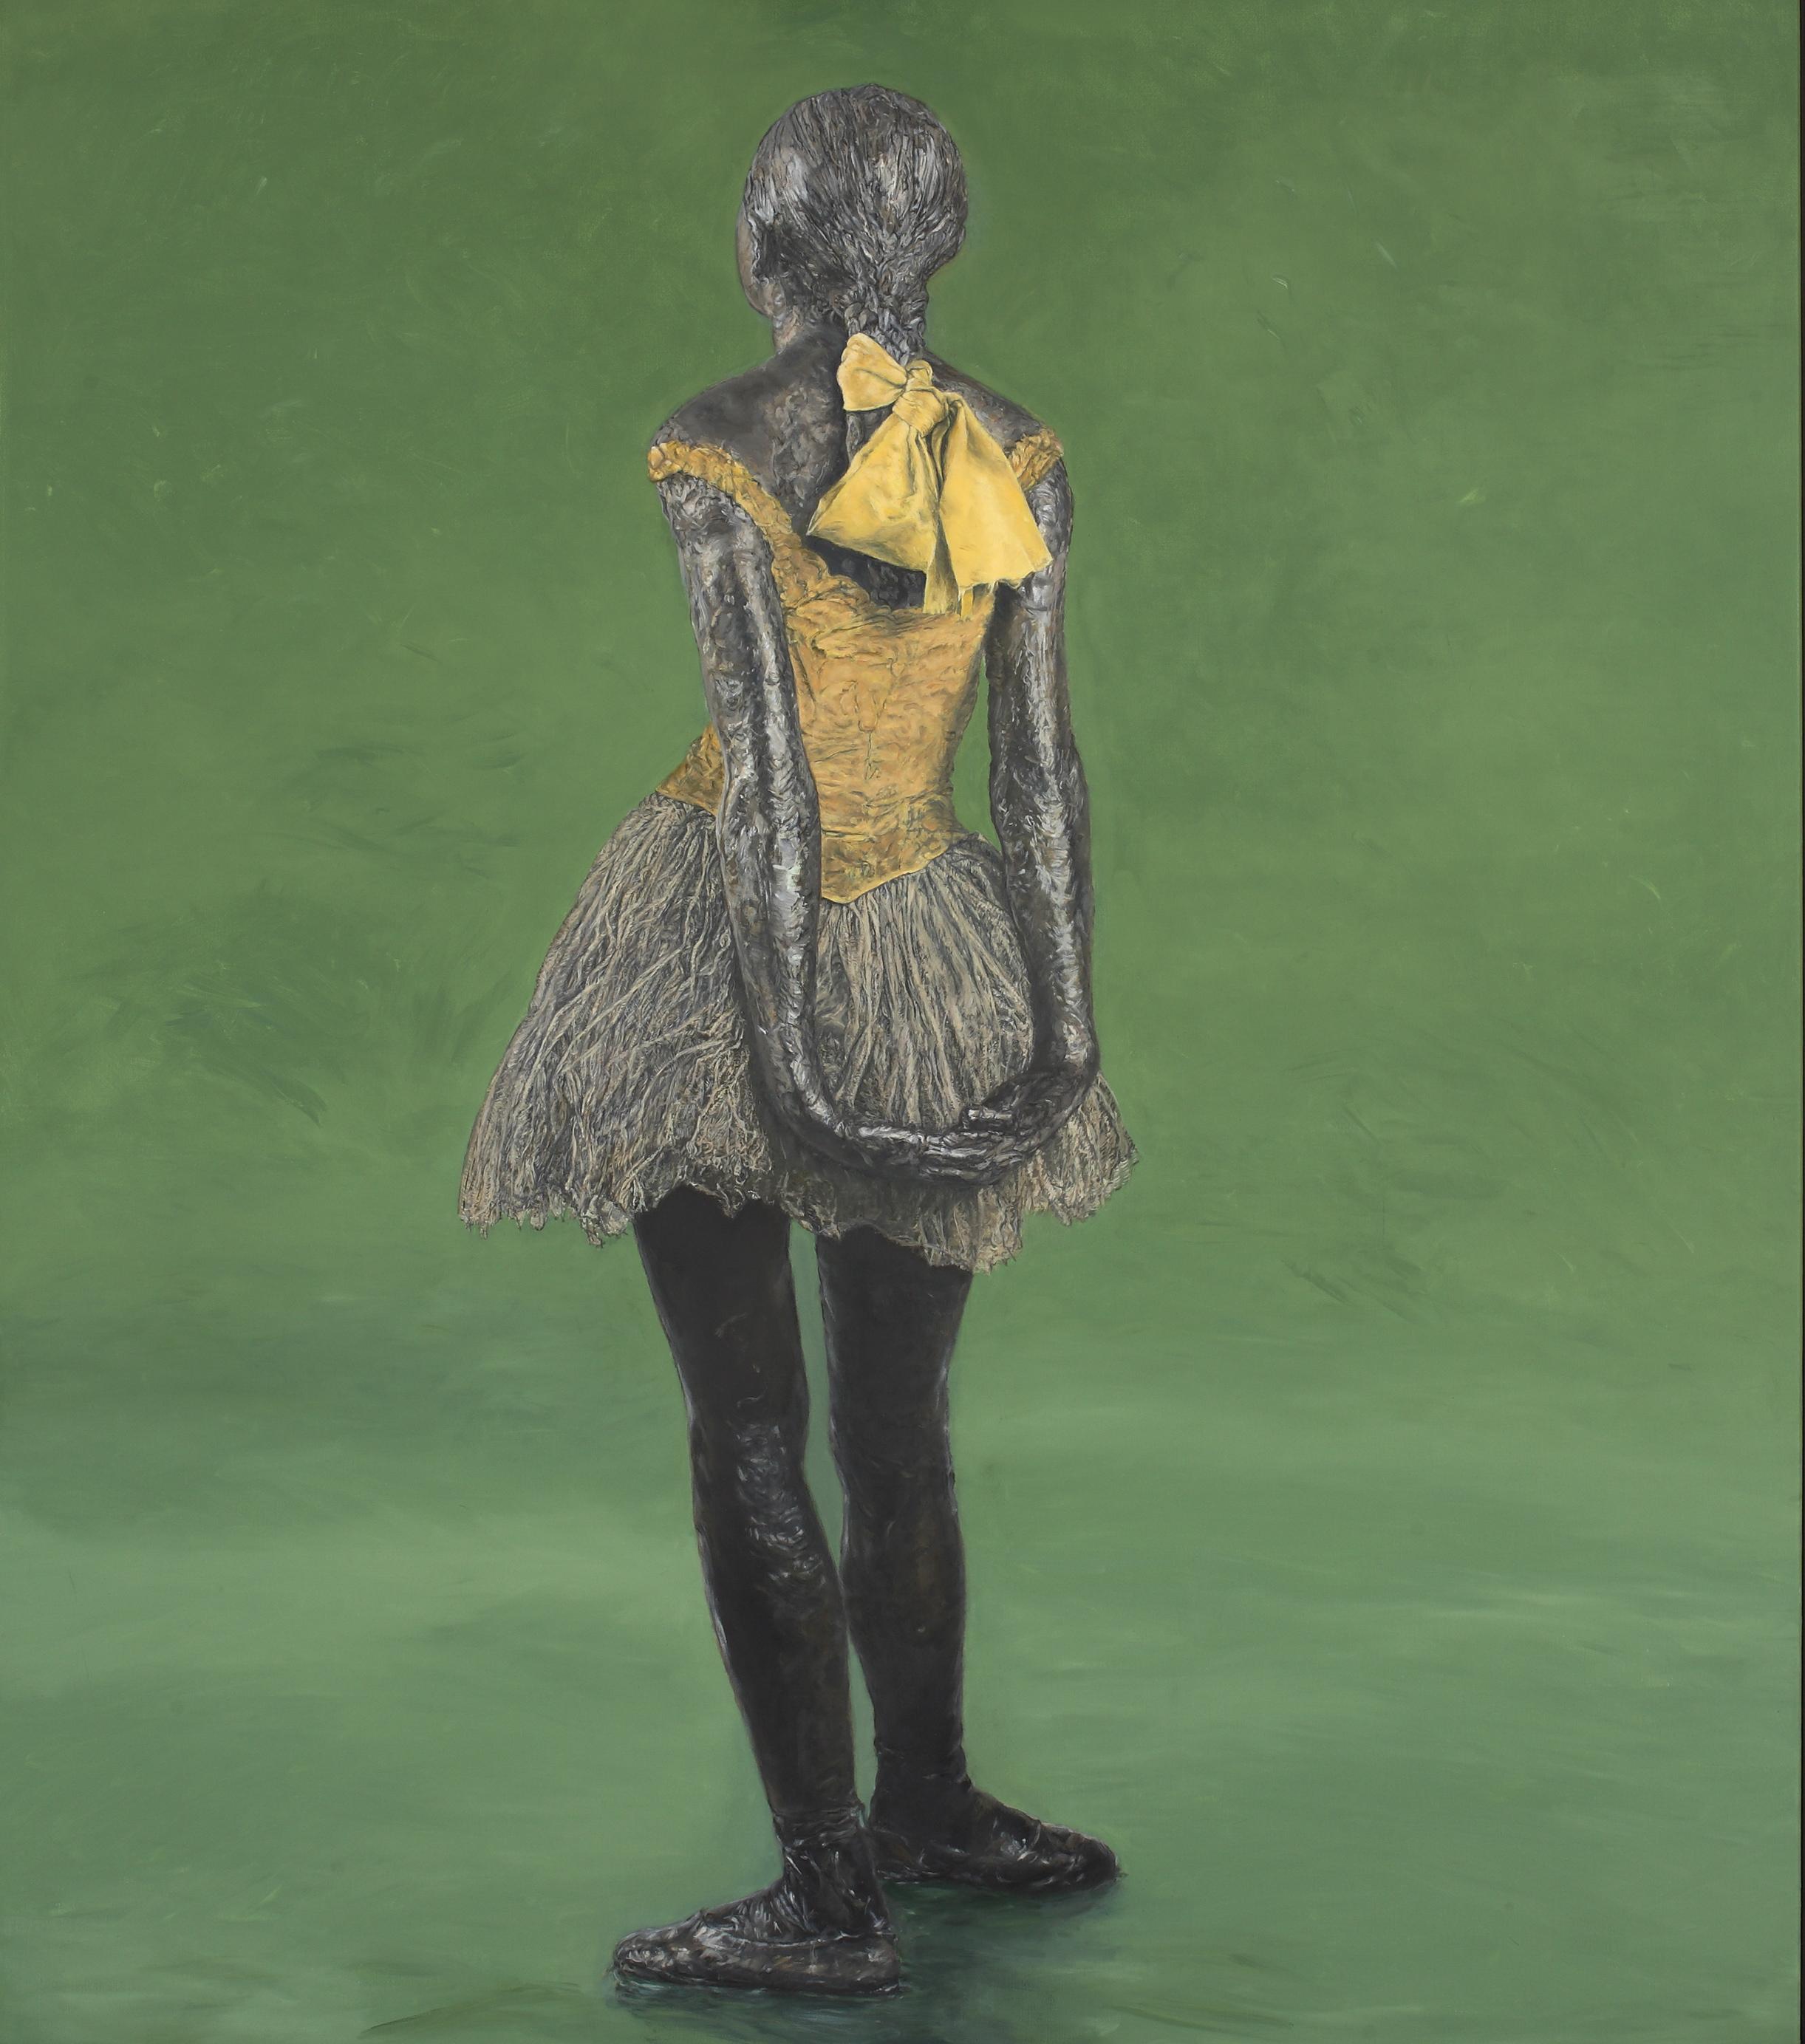 Little Fourteen-Year-Old Dancer on Green